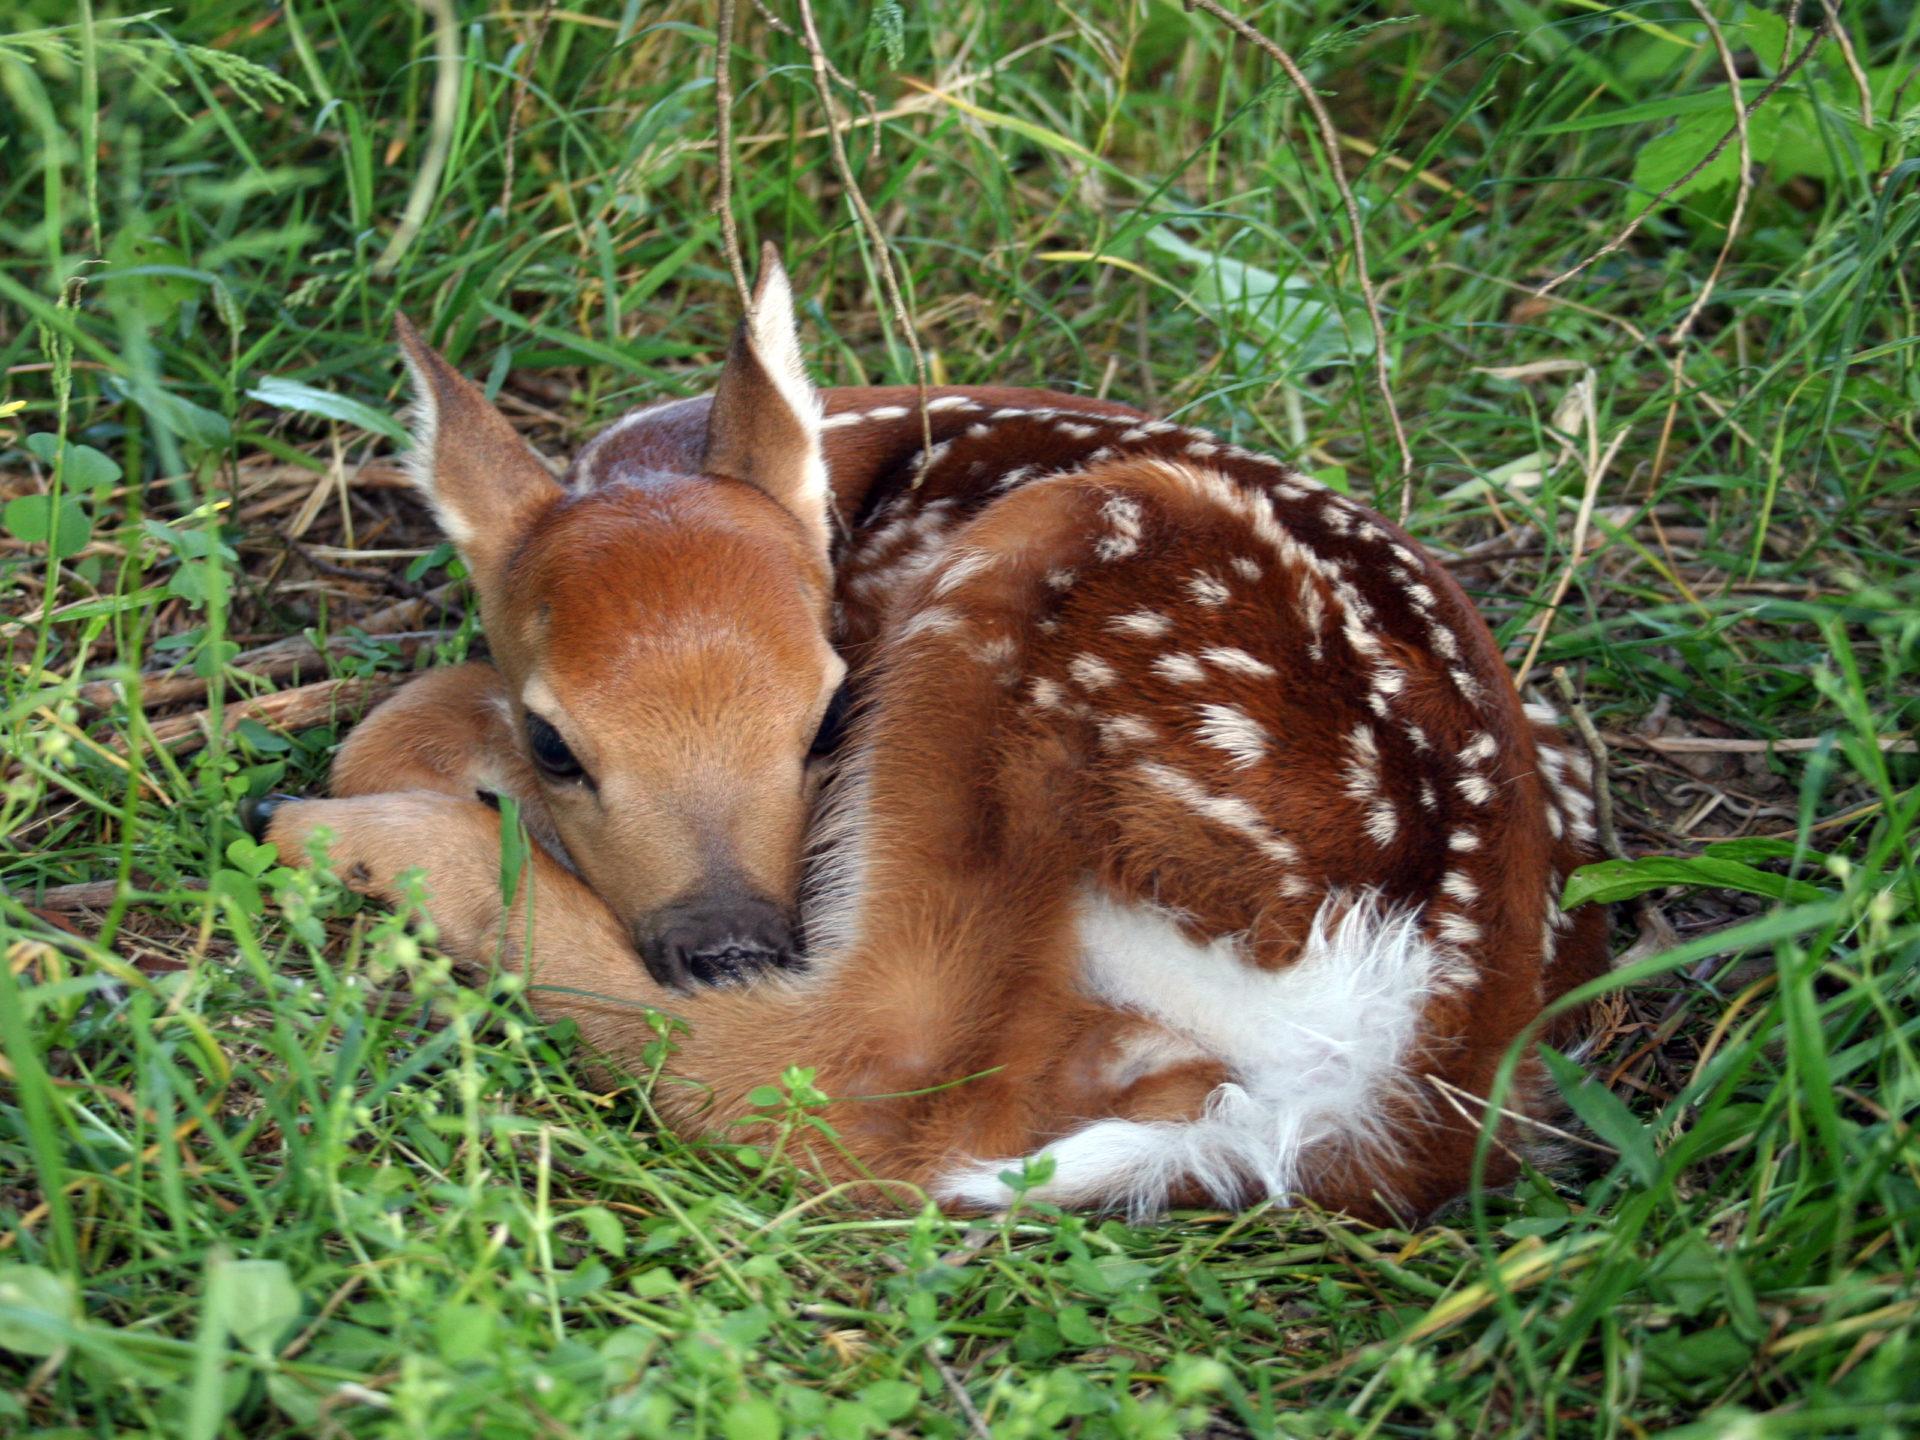 Cute Cubs Wallpaper Baby Deer Hd Wallpaper 59207 Wallpapers13 Com